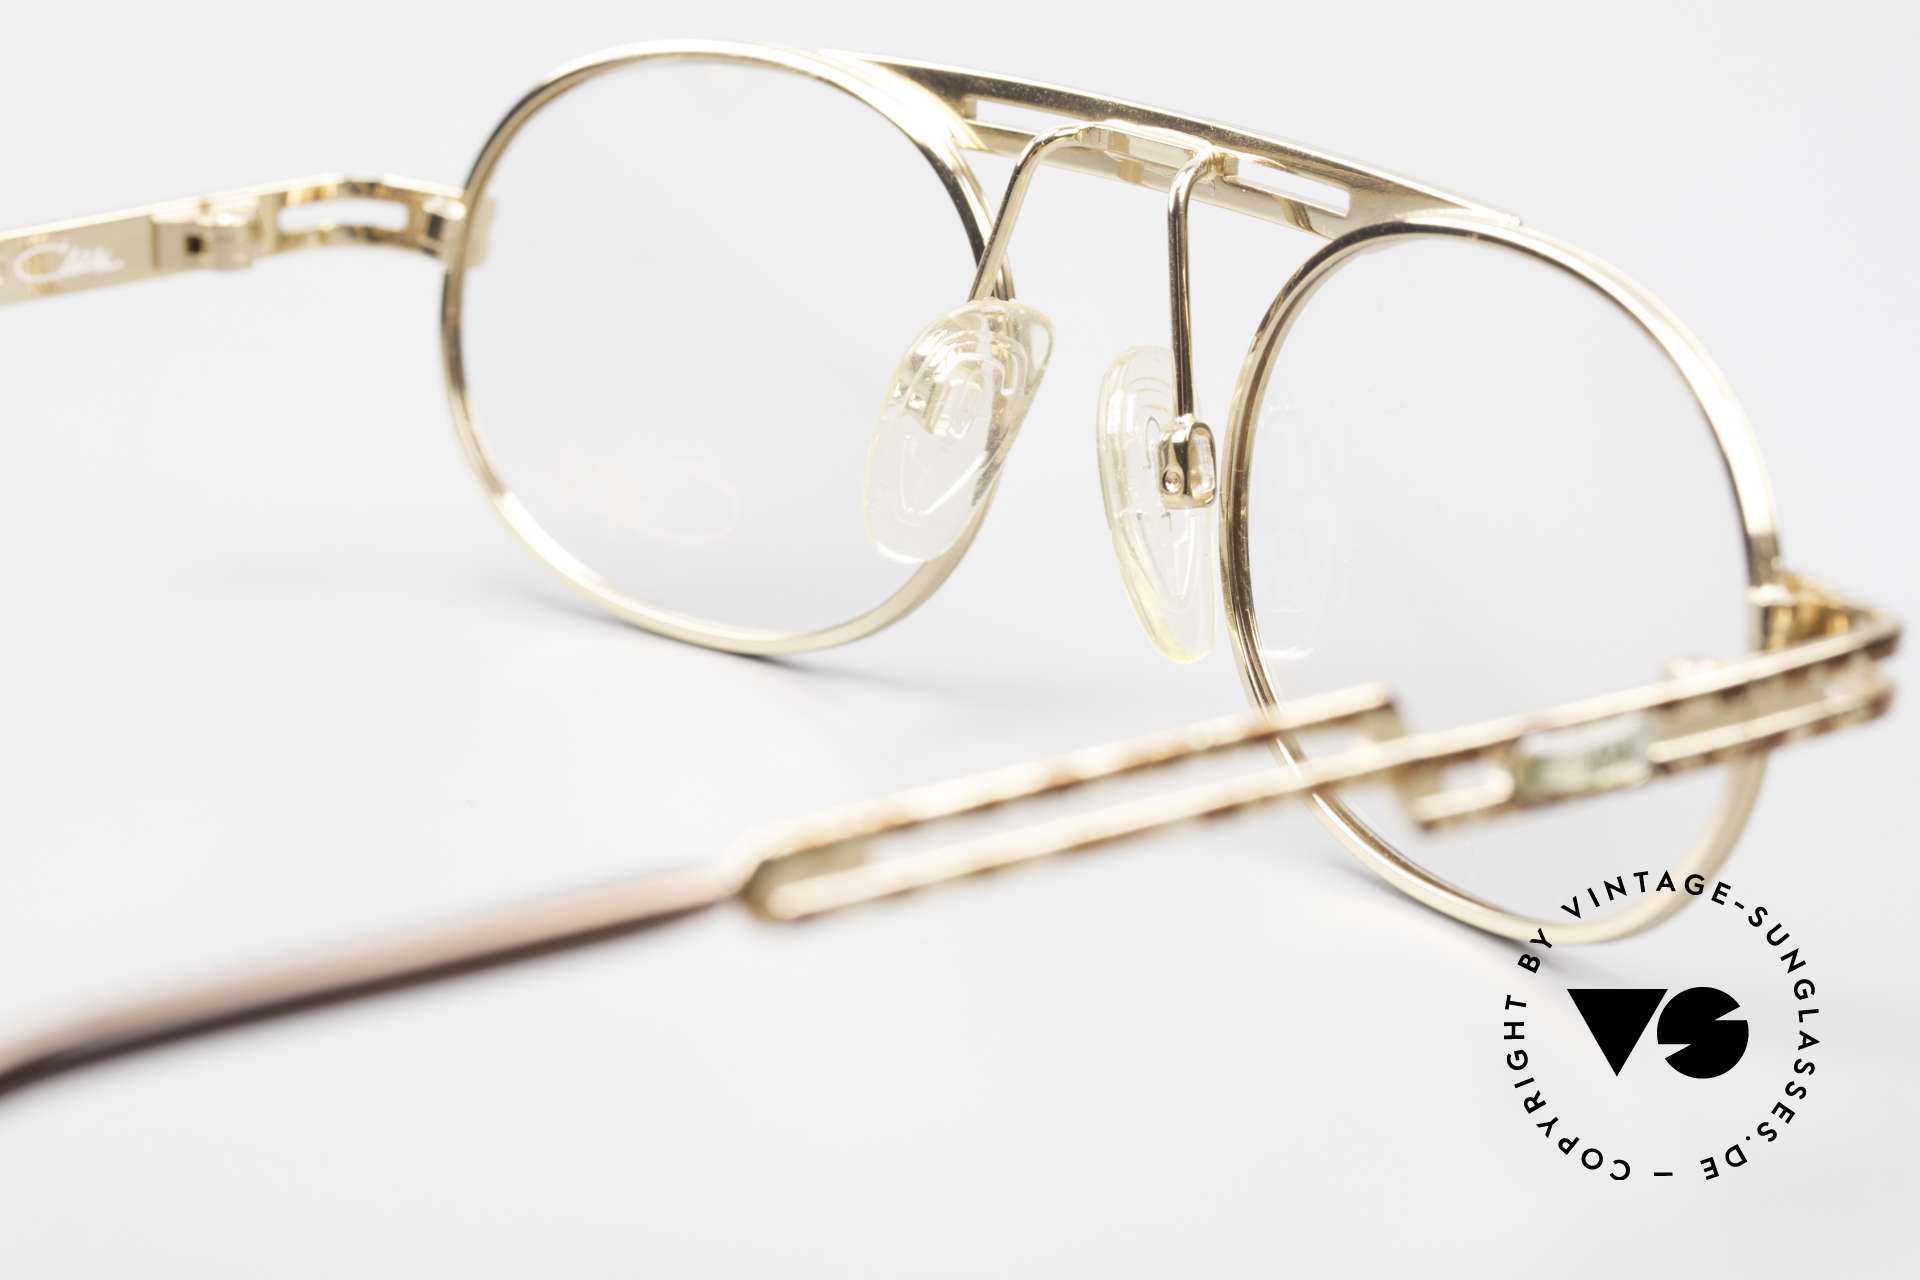 Cazal 762 Oval Vintage Eyeglasses 90's, frame is made for lenses of any kind (optical / sun), Made for Men and Women